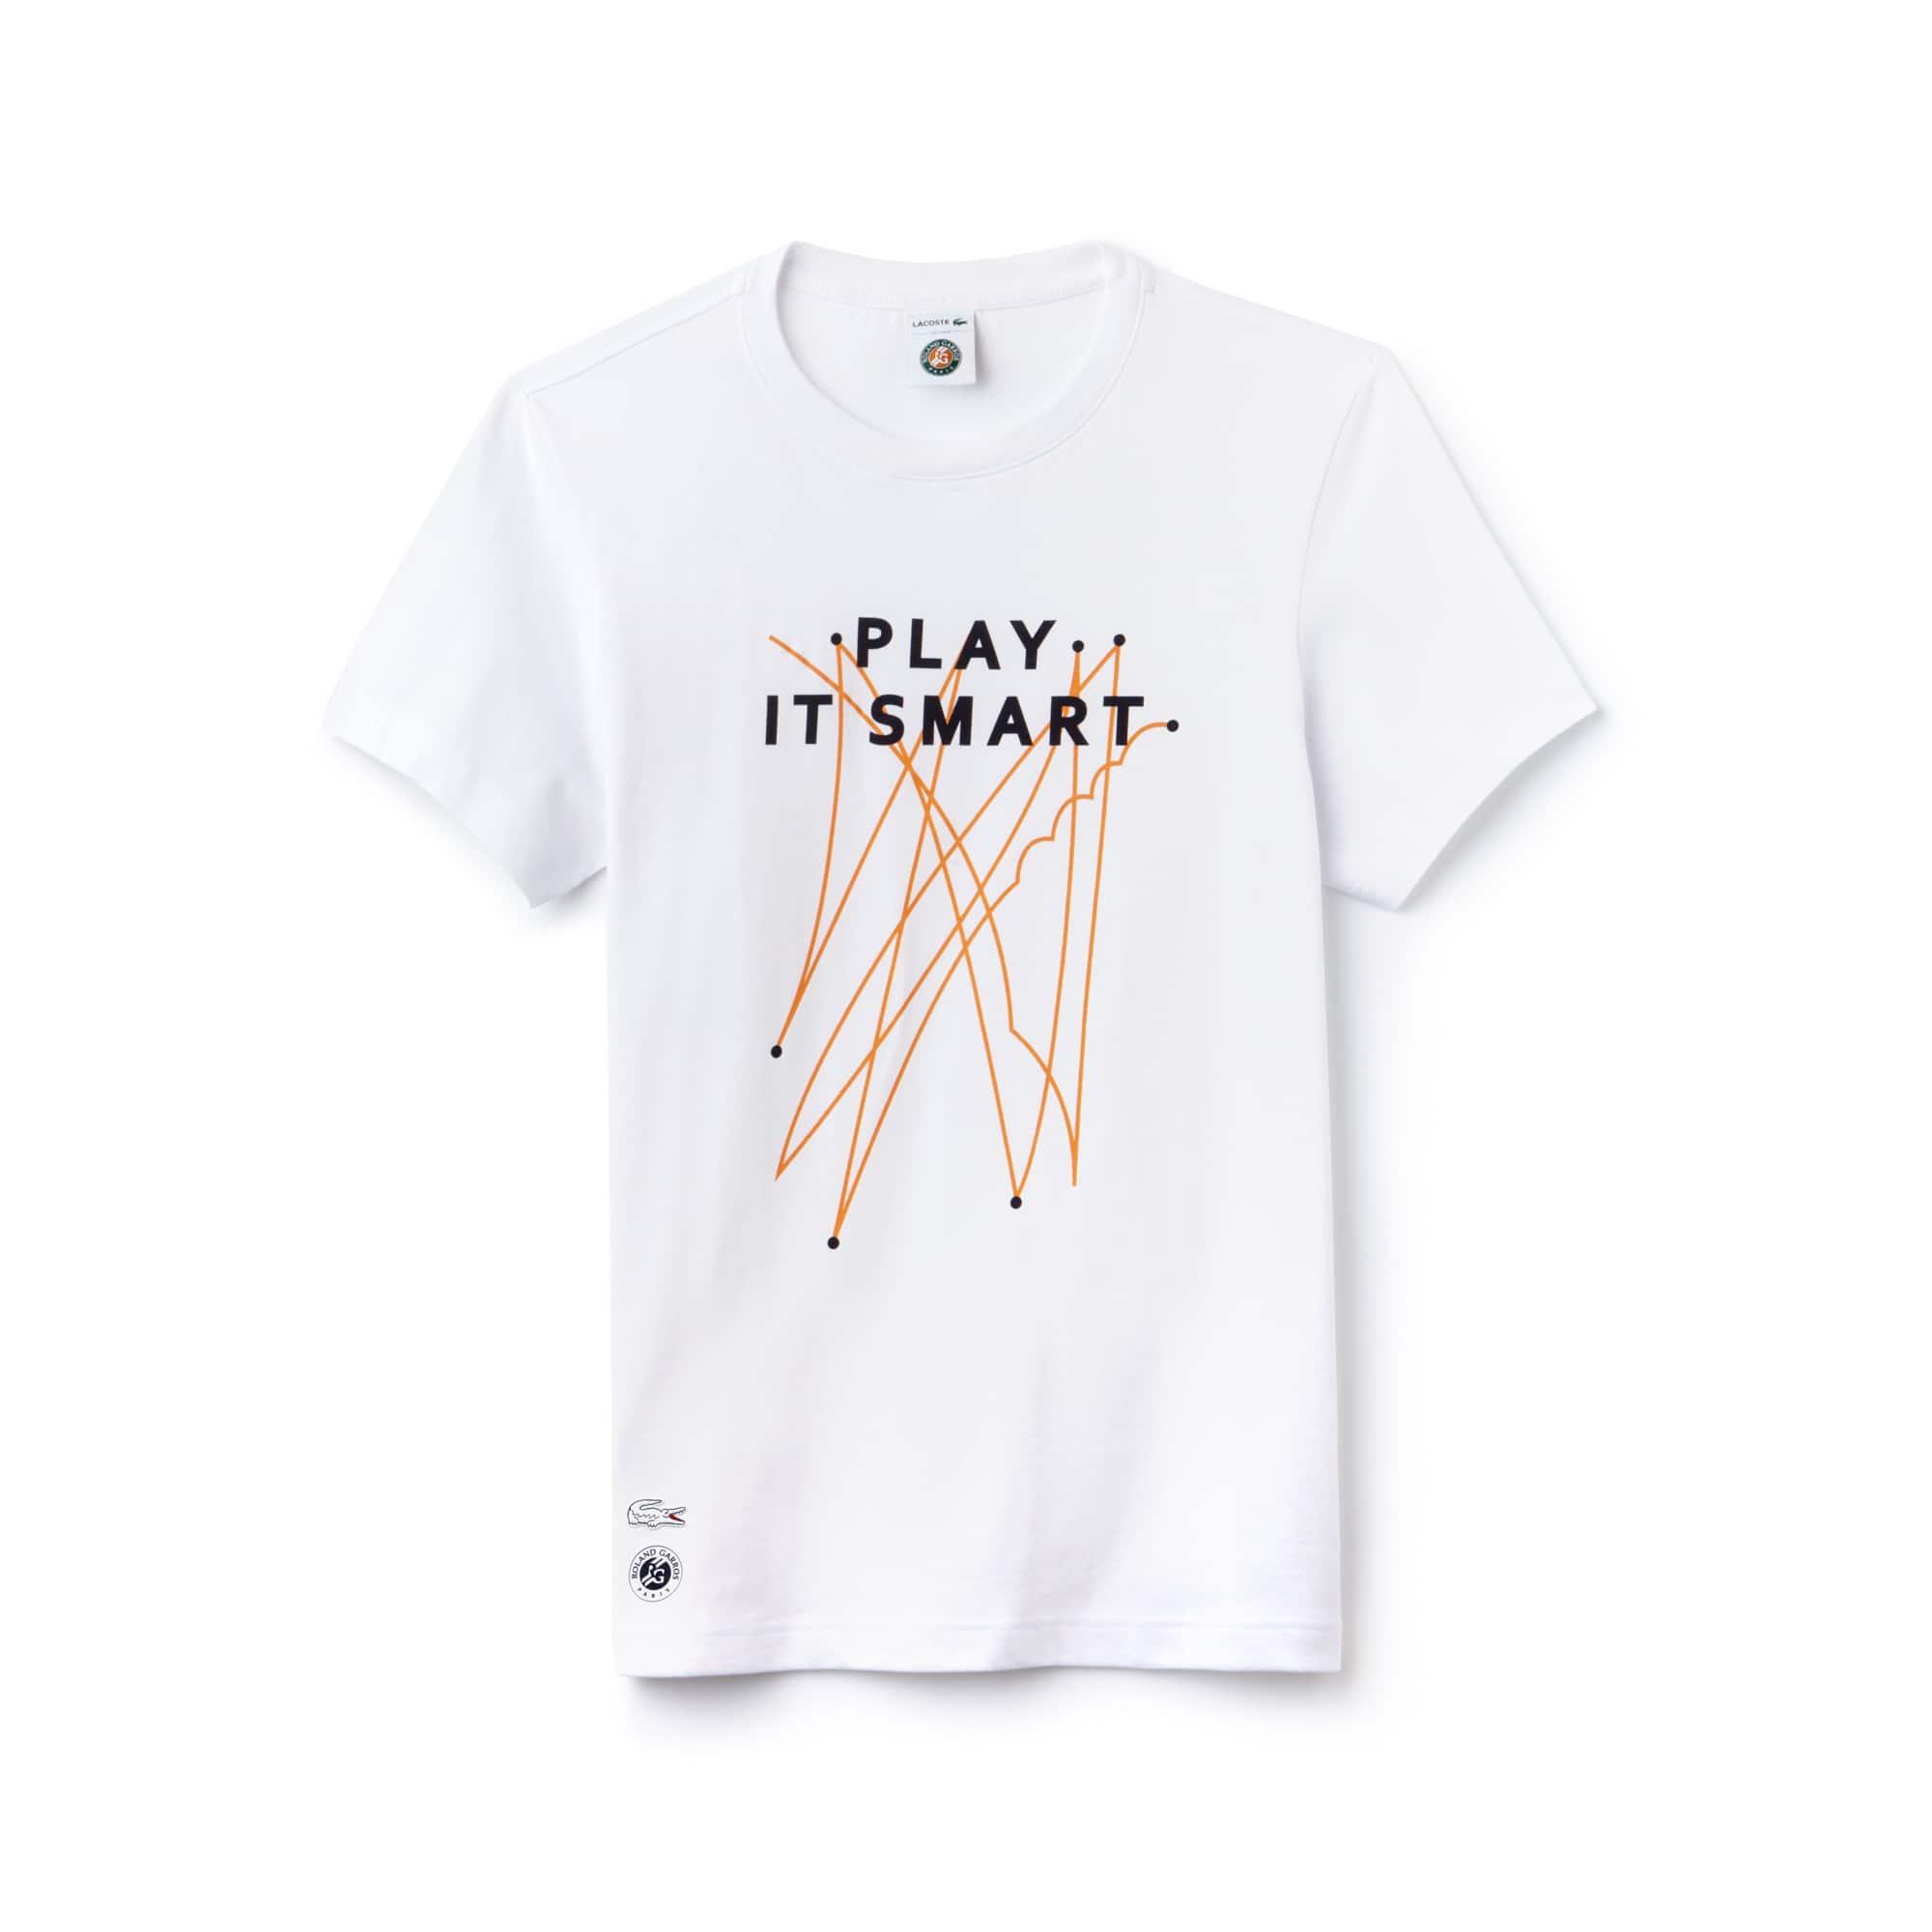 Men's Lacoste SPORT Roland Garros Edition Technical Jersey T-shirt